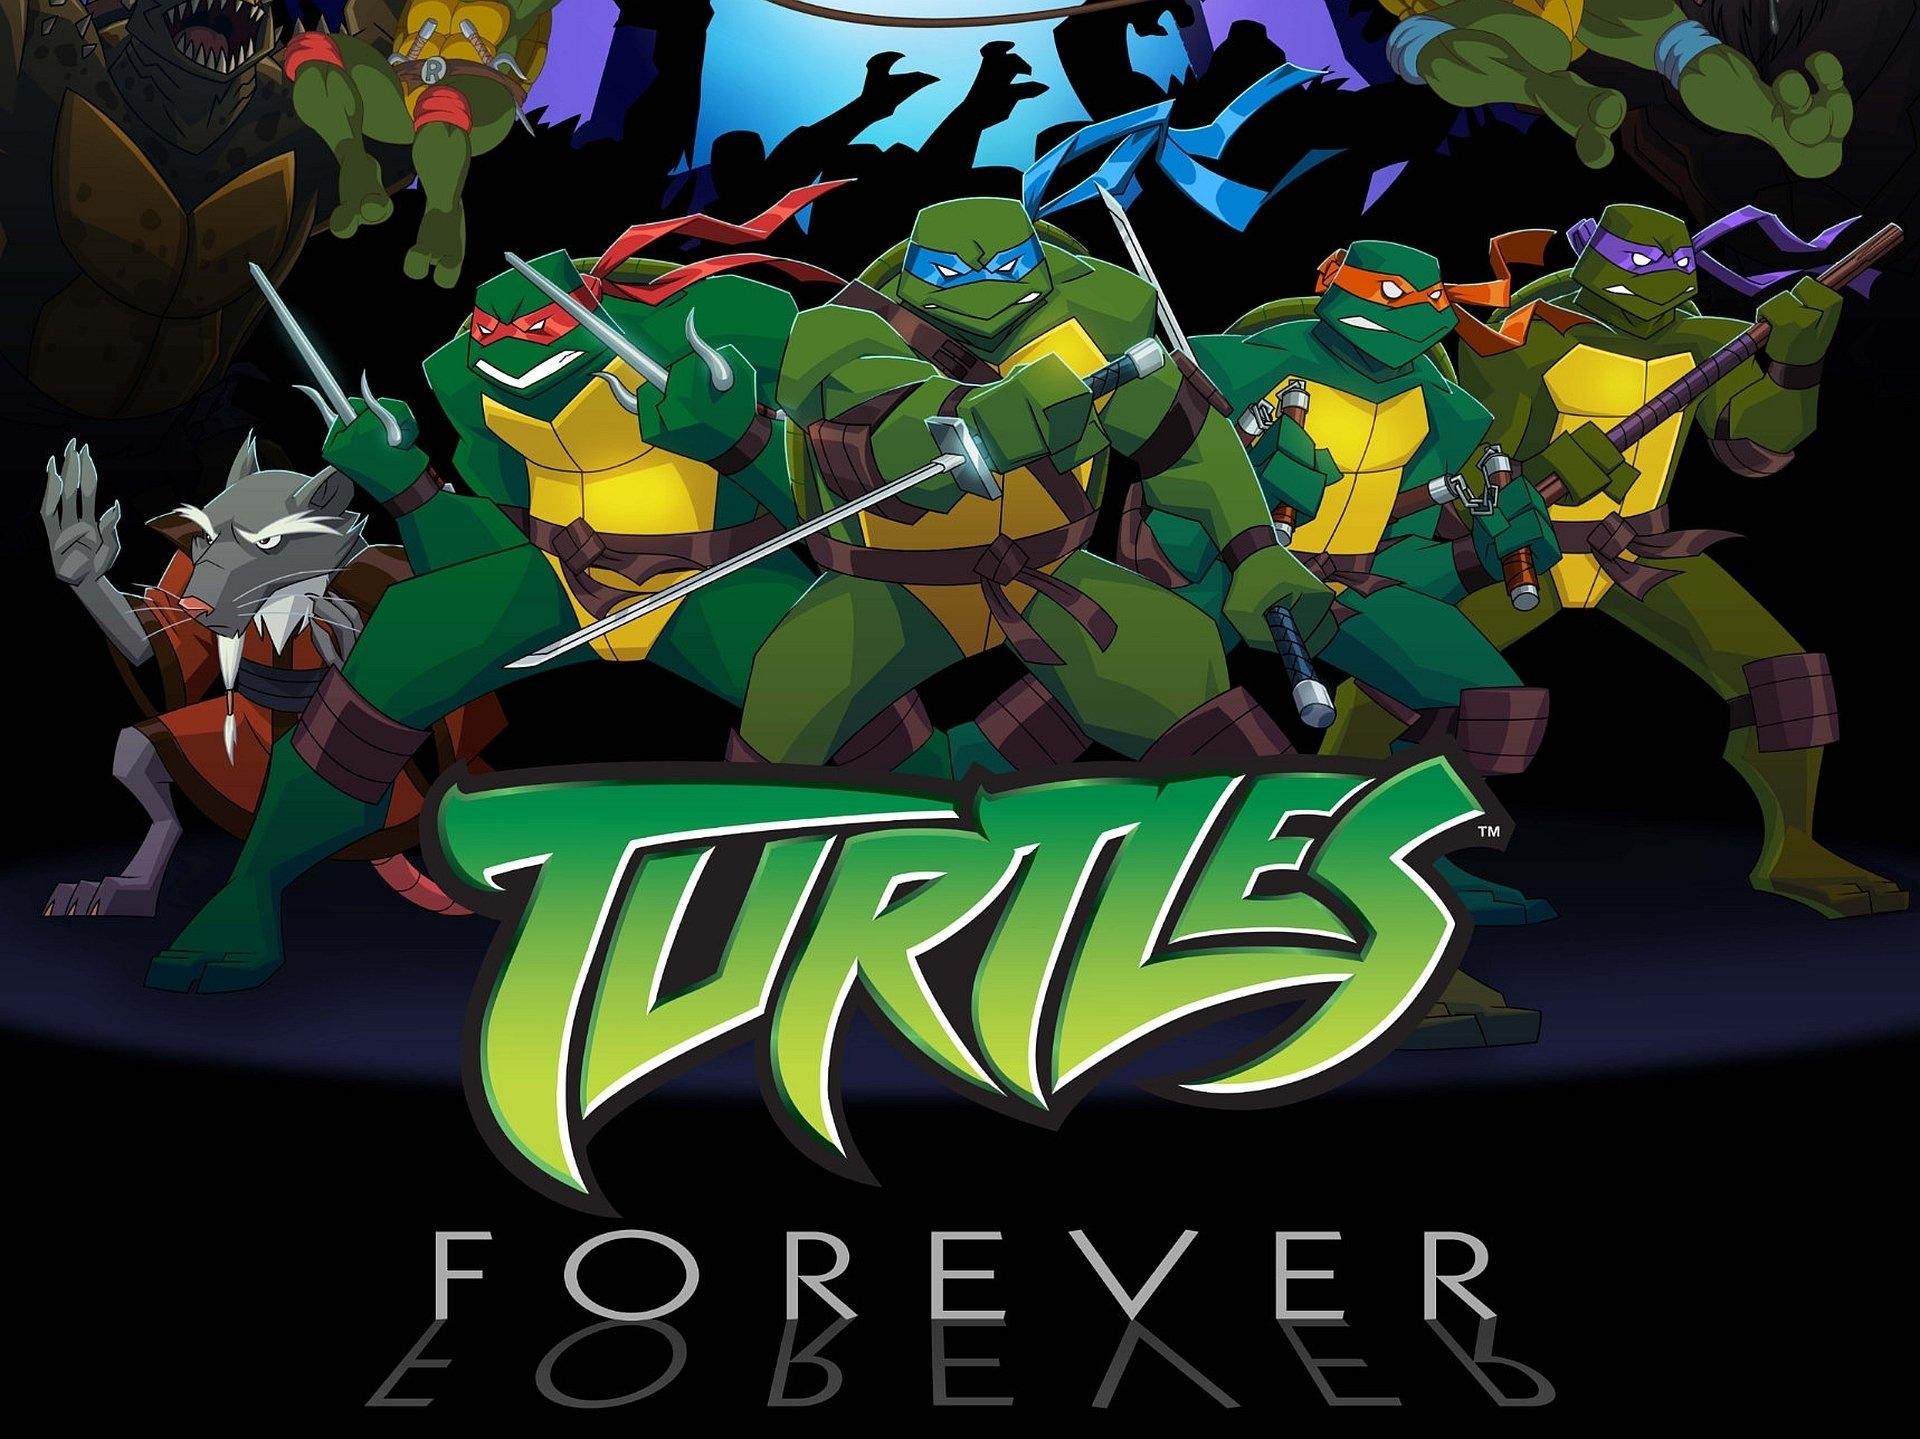 MORMON MOVIE REVIEW Teenage Mutant Ninja Turtles Jeffreys Blog